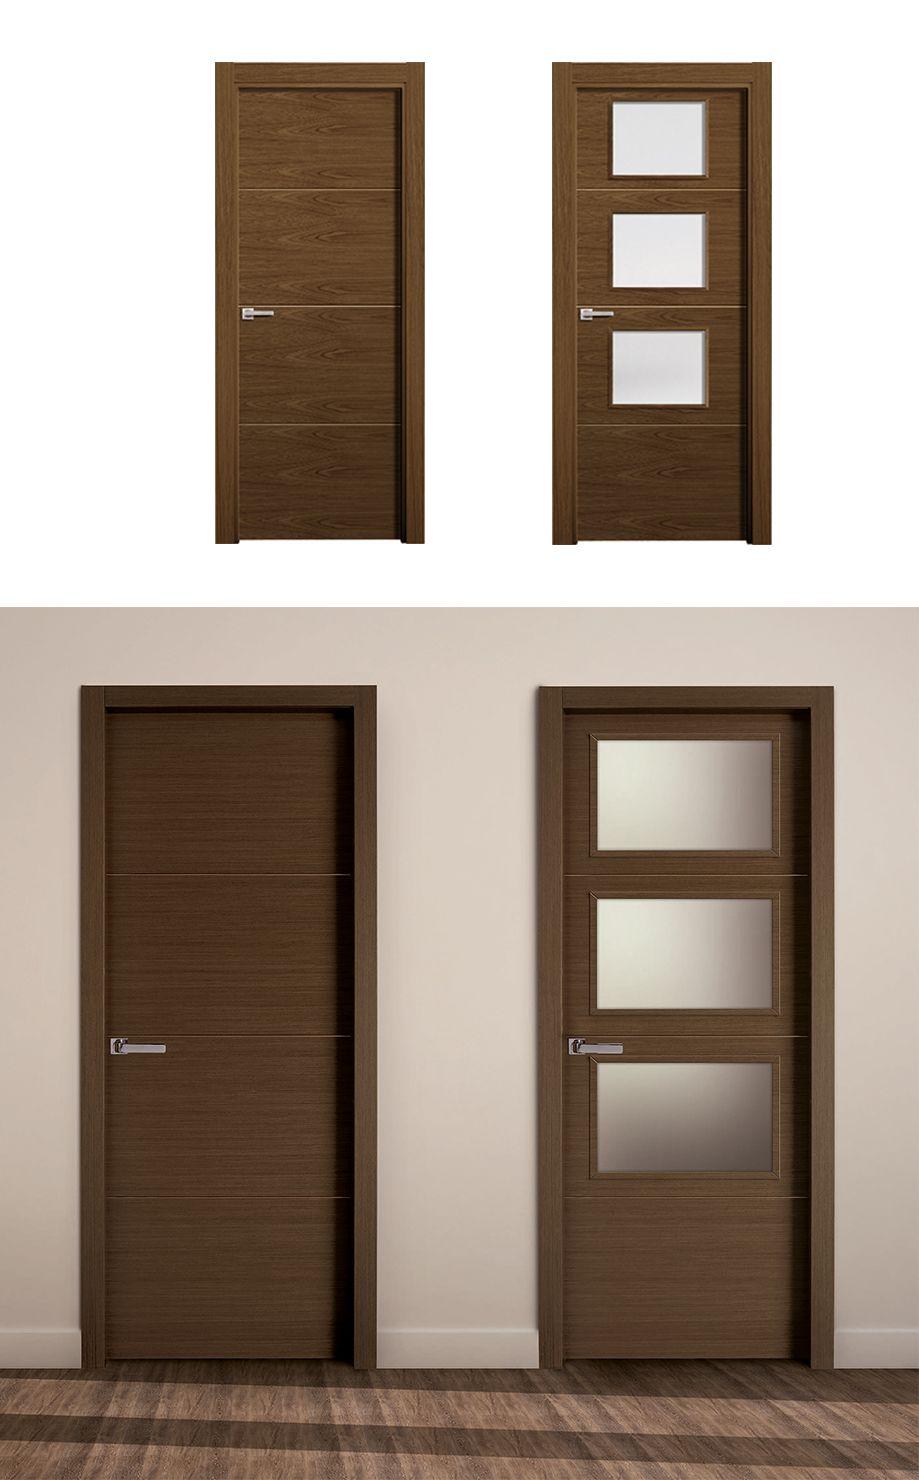 Puerta de interior oscura modelo ganges de la serie for Modelos de puertas de madera